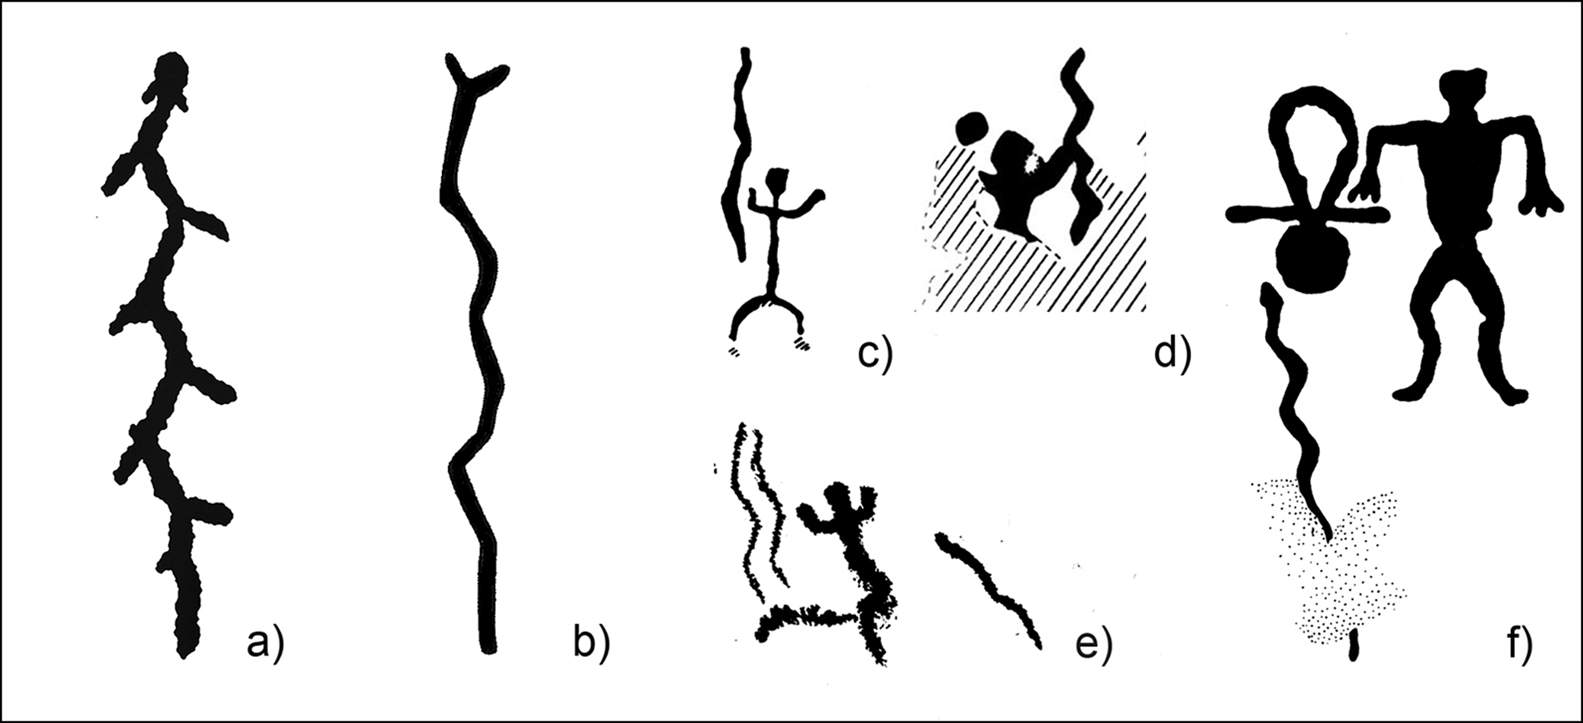 Depictions of snakes in Neolithic rock art from various North European sites. a) Lake Onega; b) Kola Peninsula; c-e) Finland ; f) White Sea. Credit: Satu Koivisto et al. / Antiquity, 2021